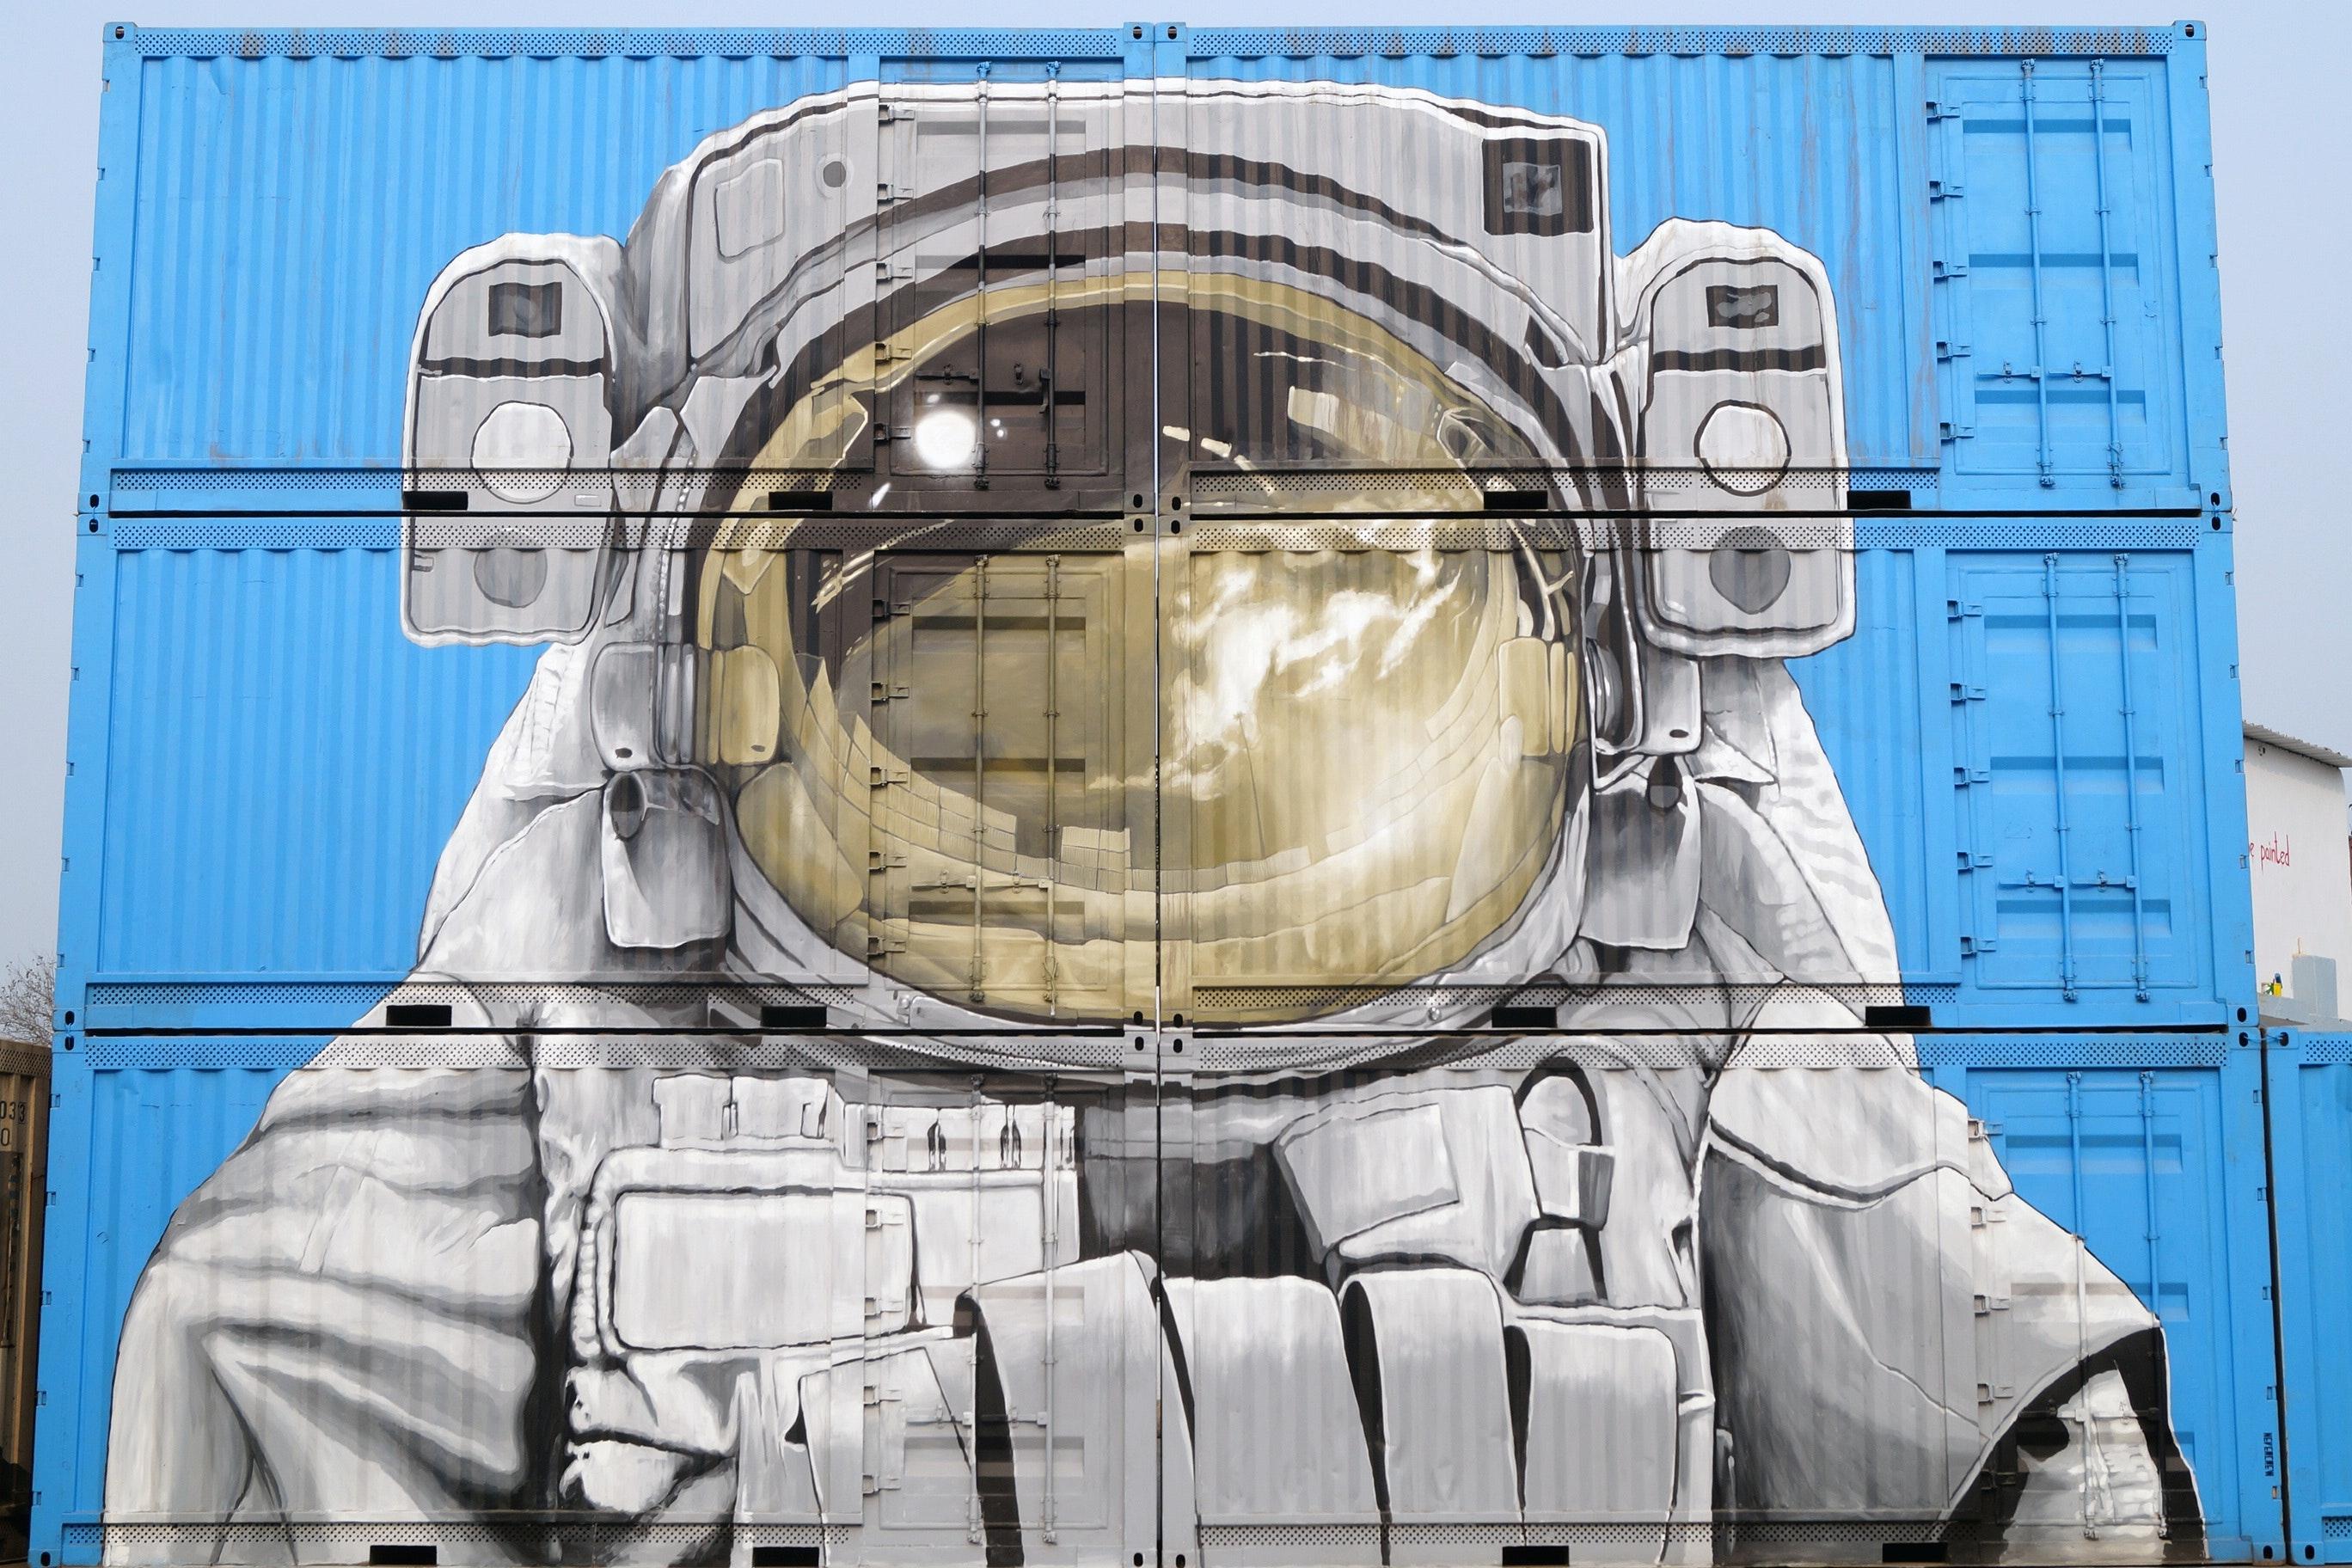 Astronaut Graffiti on Semi-Trailers, Architecture, Freight, Travel, Transportation system, HQ Photo